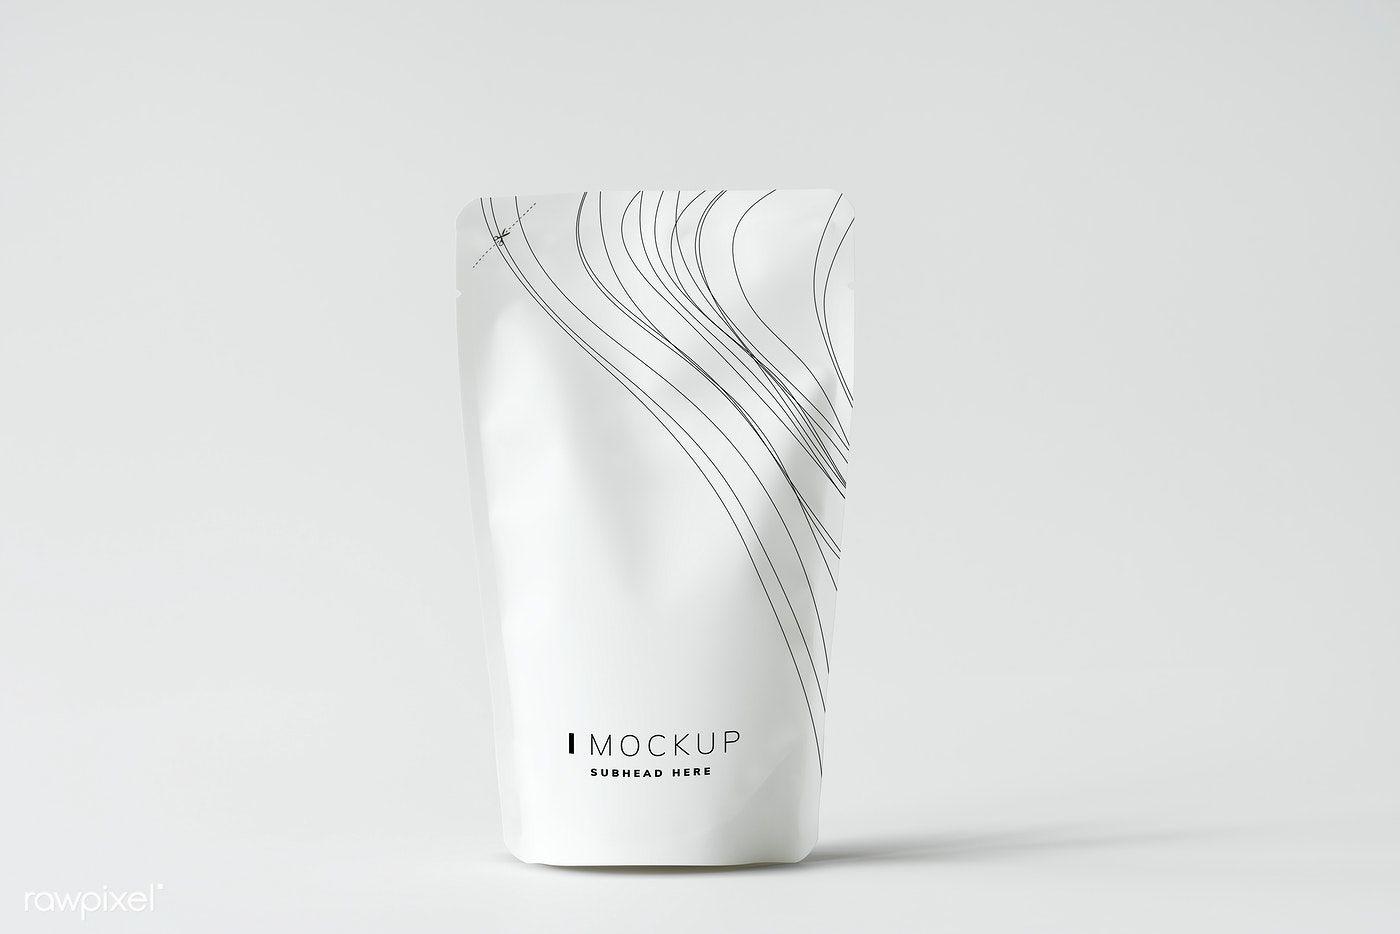 Download Download Premium Psd Of White Sachet Mockup Against White Background 502904 Bag Mockup Mockup Candle Mockup